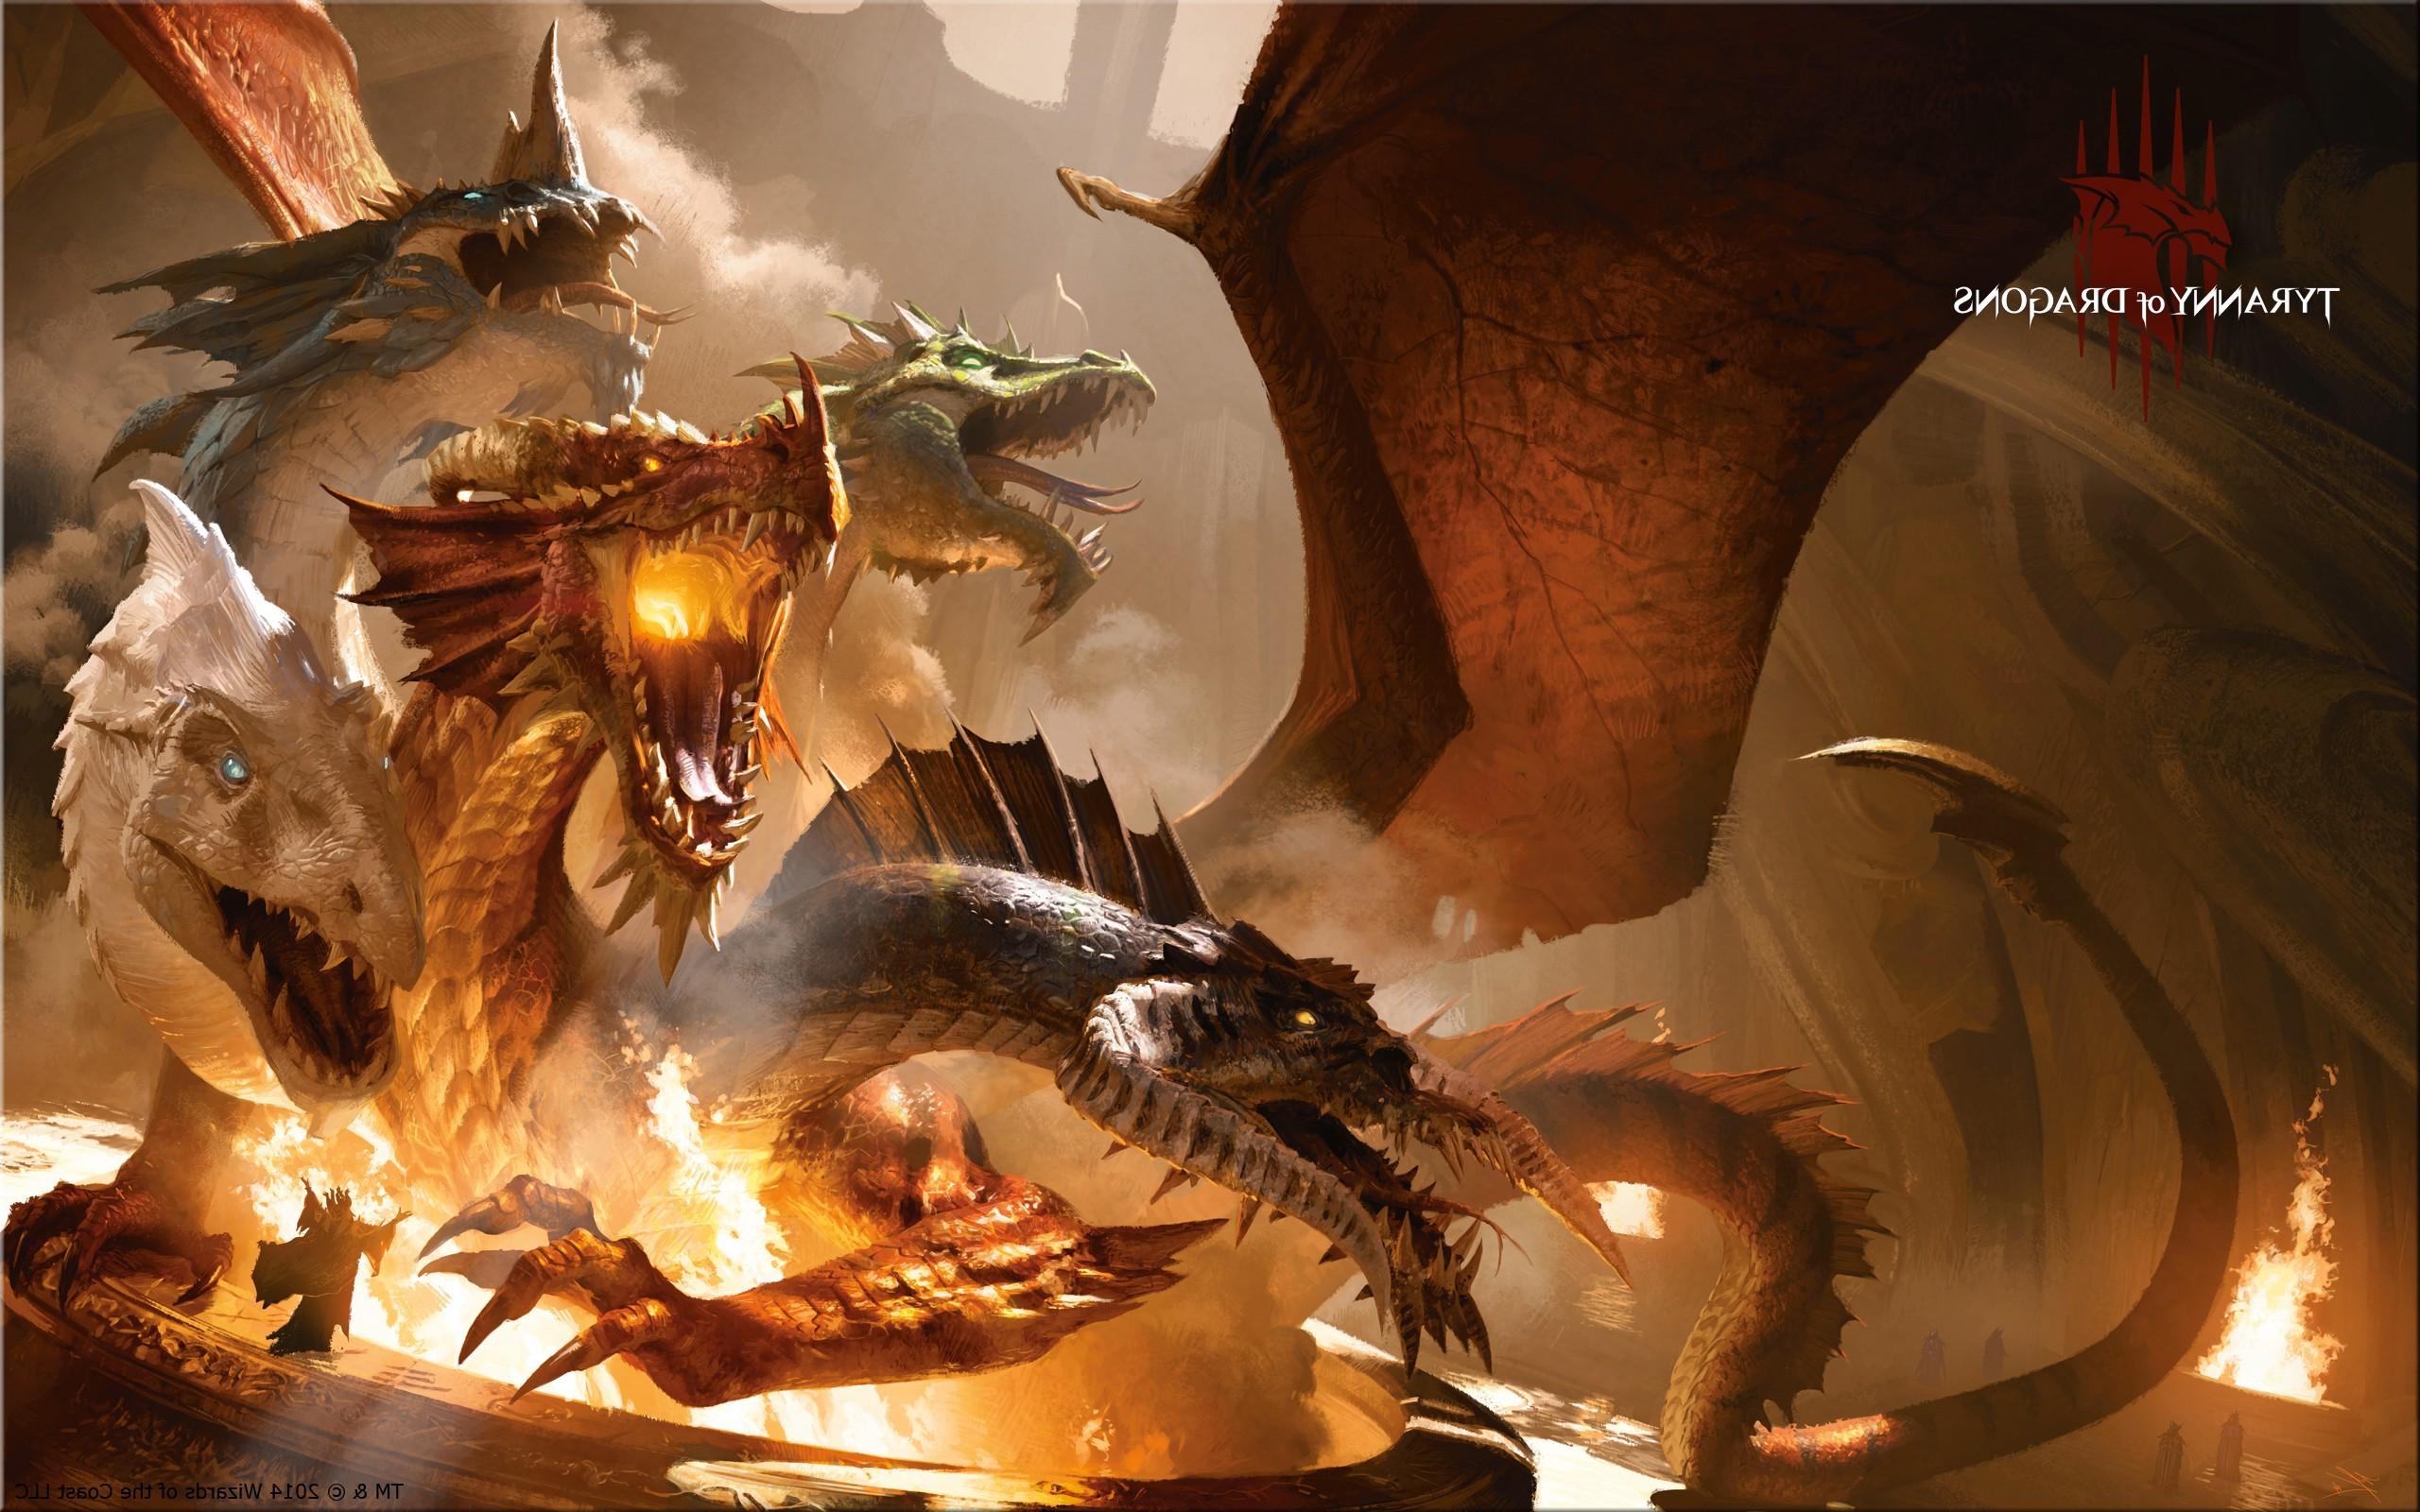 400 Pixels Wide Wallpapers Of Cars Dragon Dungeons And Dragons Artwork Fantasy Art Tiamat